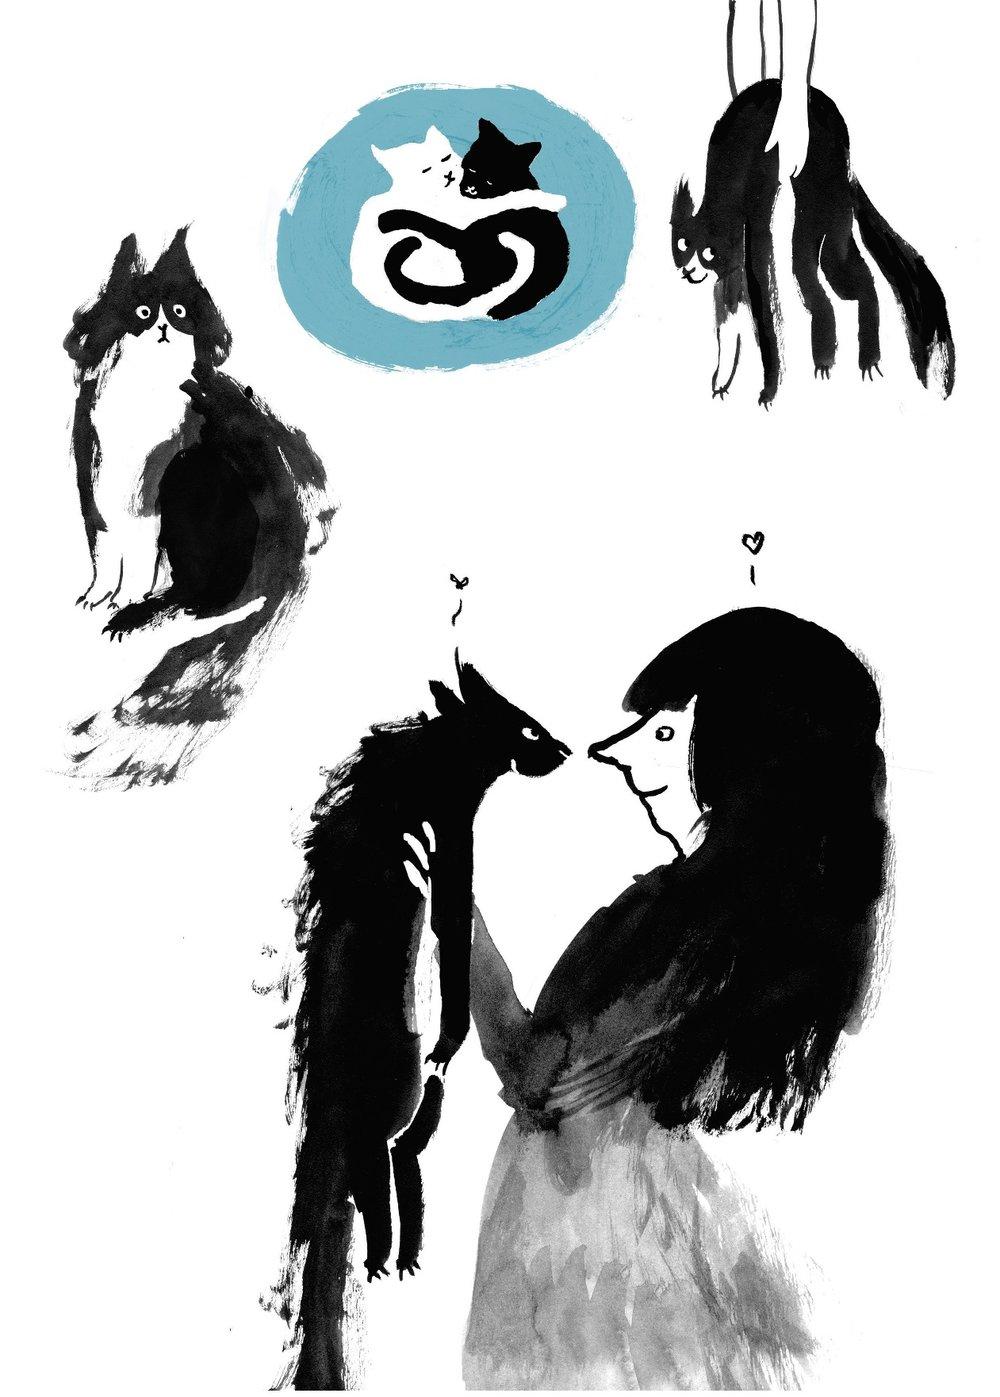 cats - Copy.jpg